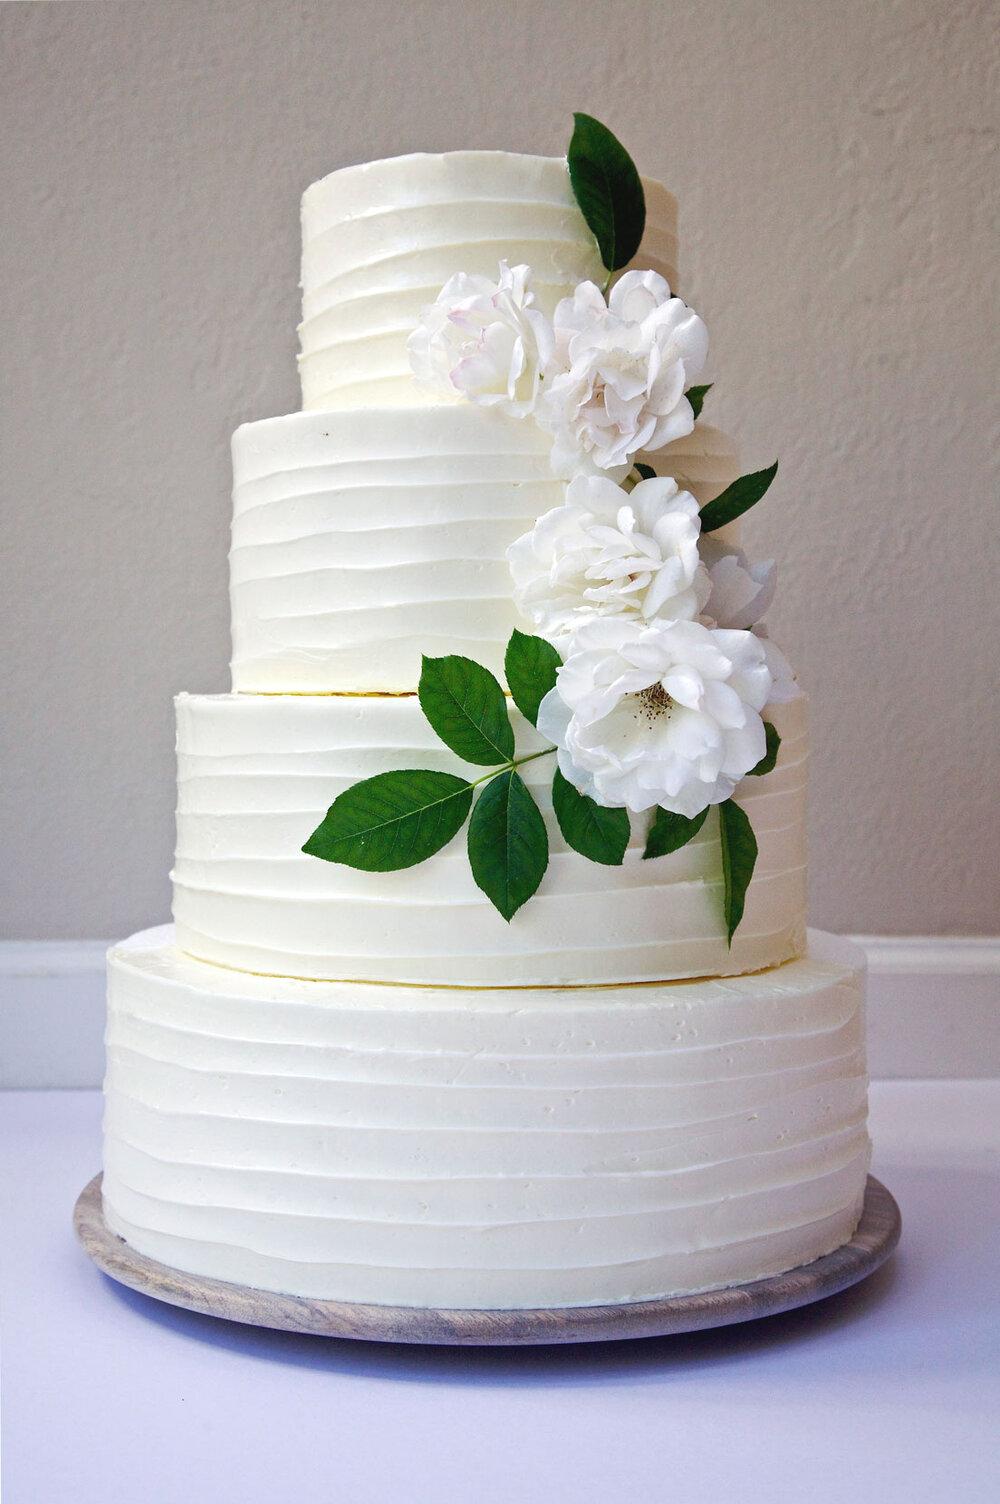 sweet-wedding-cake17.jpg